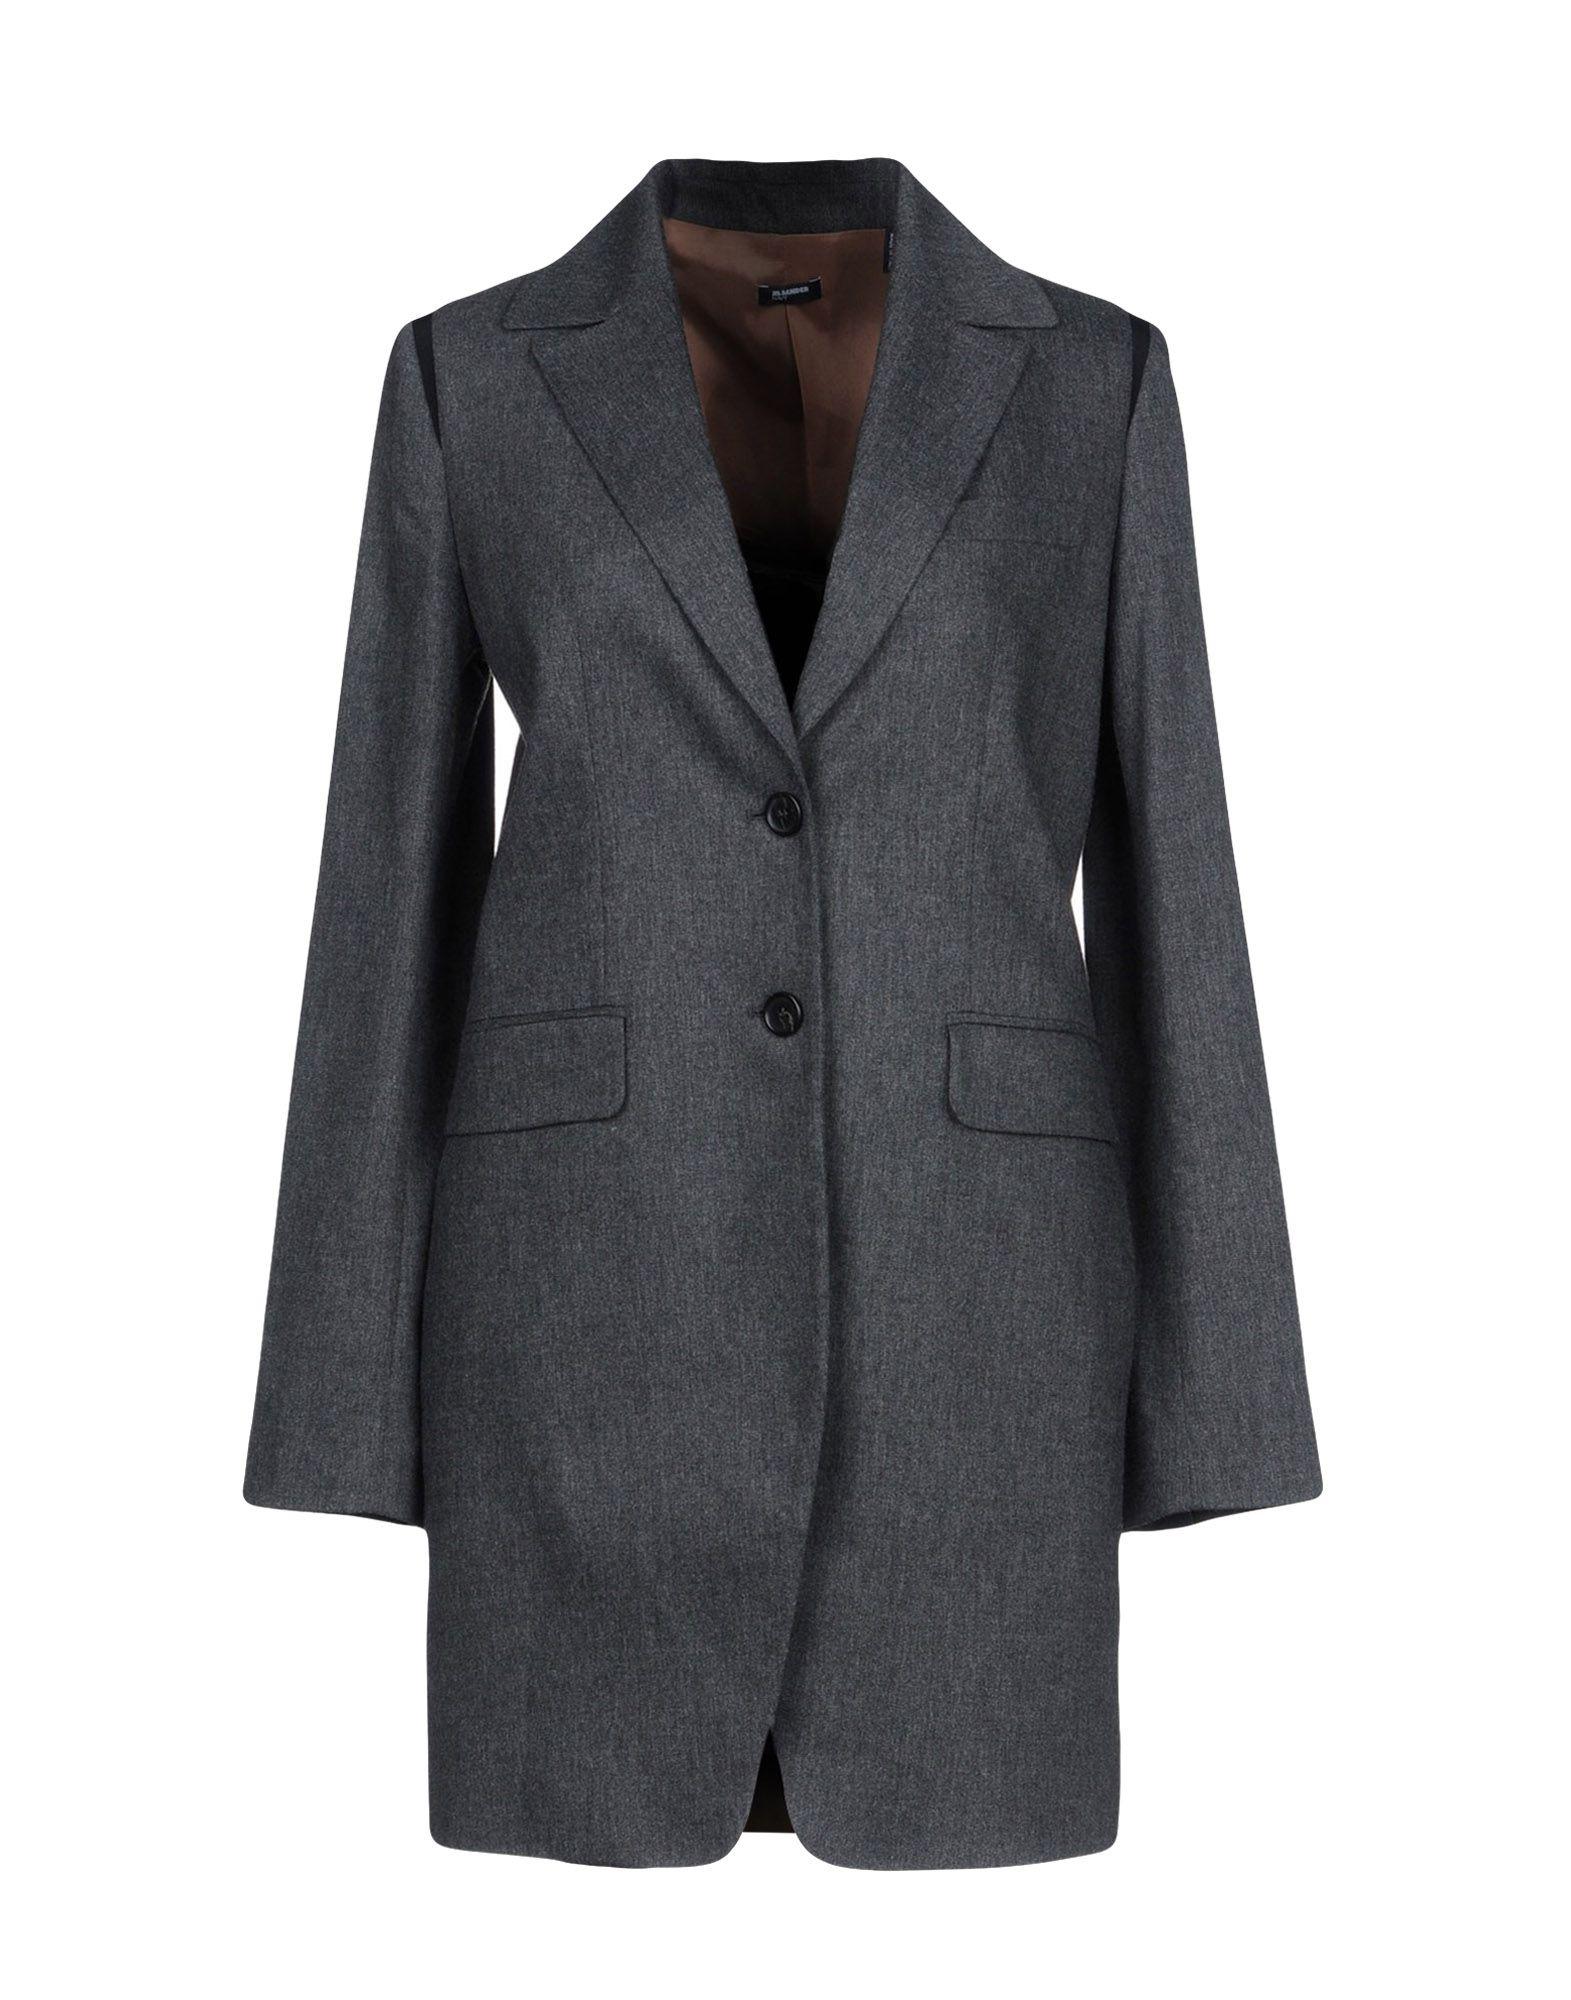 Фото - JIL SANDER NAVY Легкое пальто active cut out elastic vest in navy